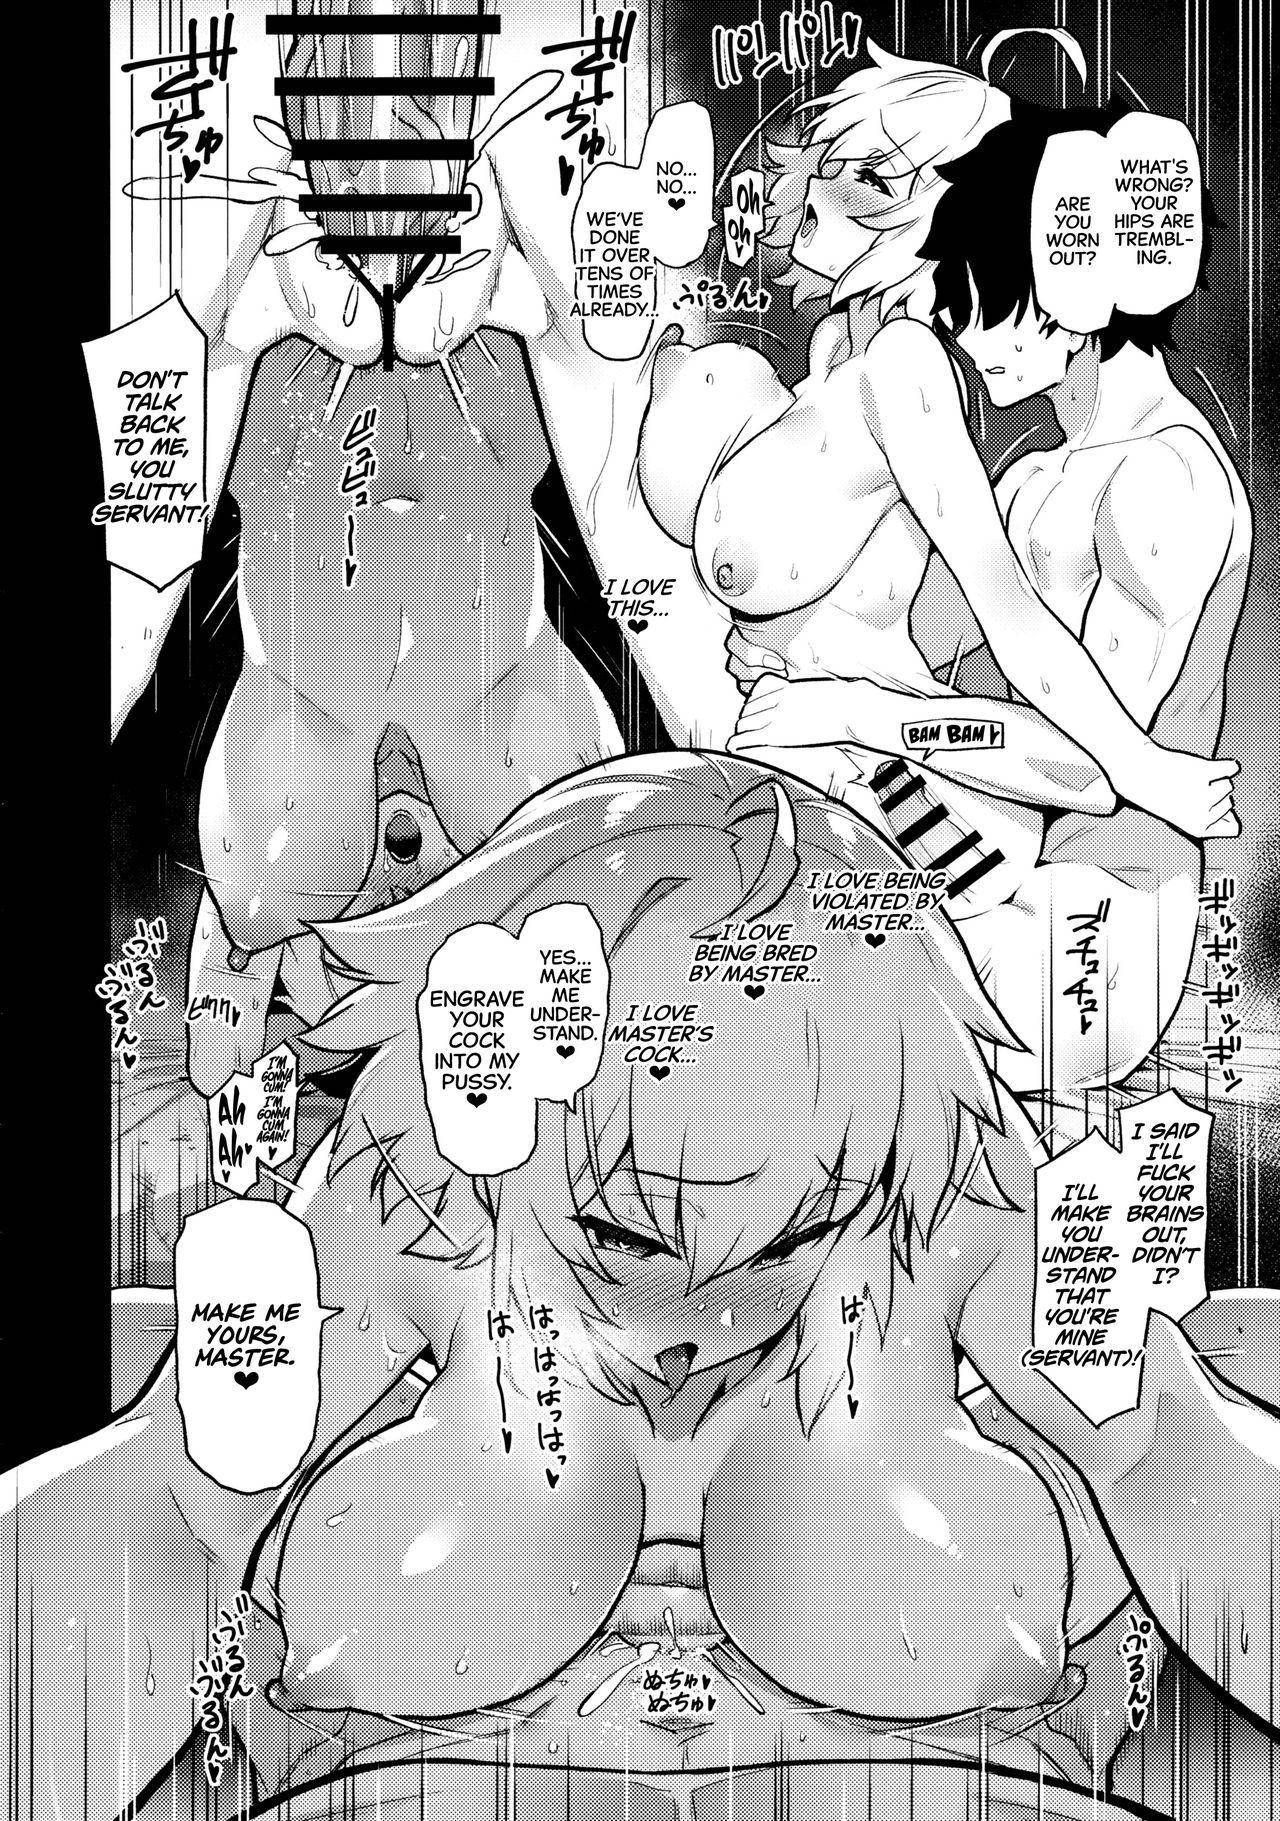 Suki Nandesho? Master wa, Kouiu no ga... | You Like This, Don't You, Master? This Sort Of Thing, I Mean... 22